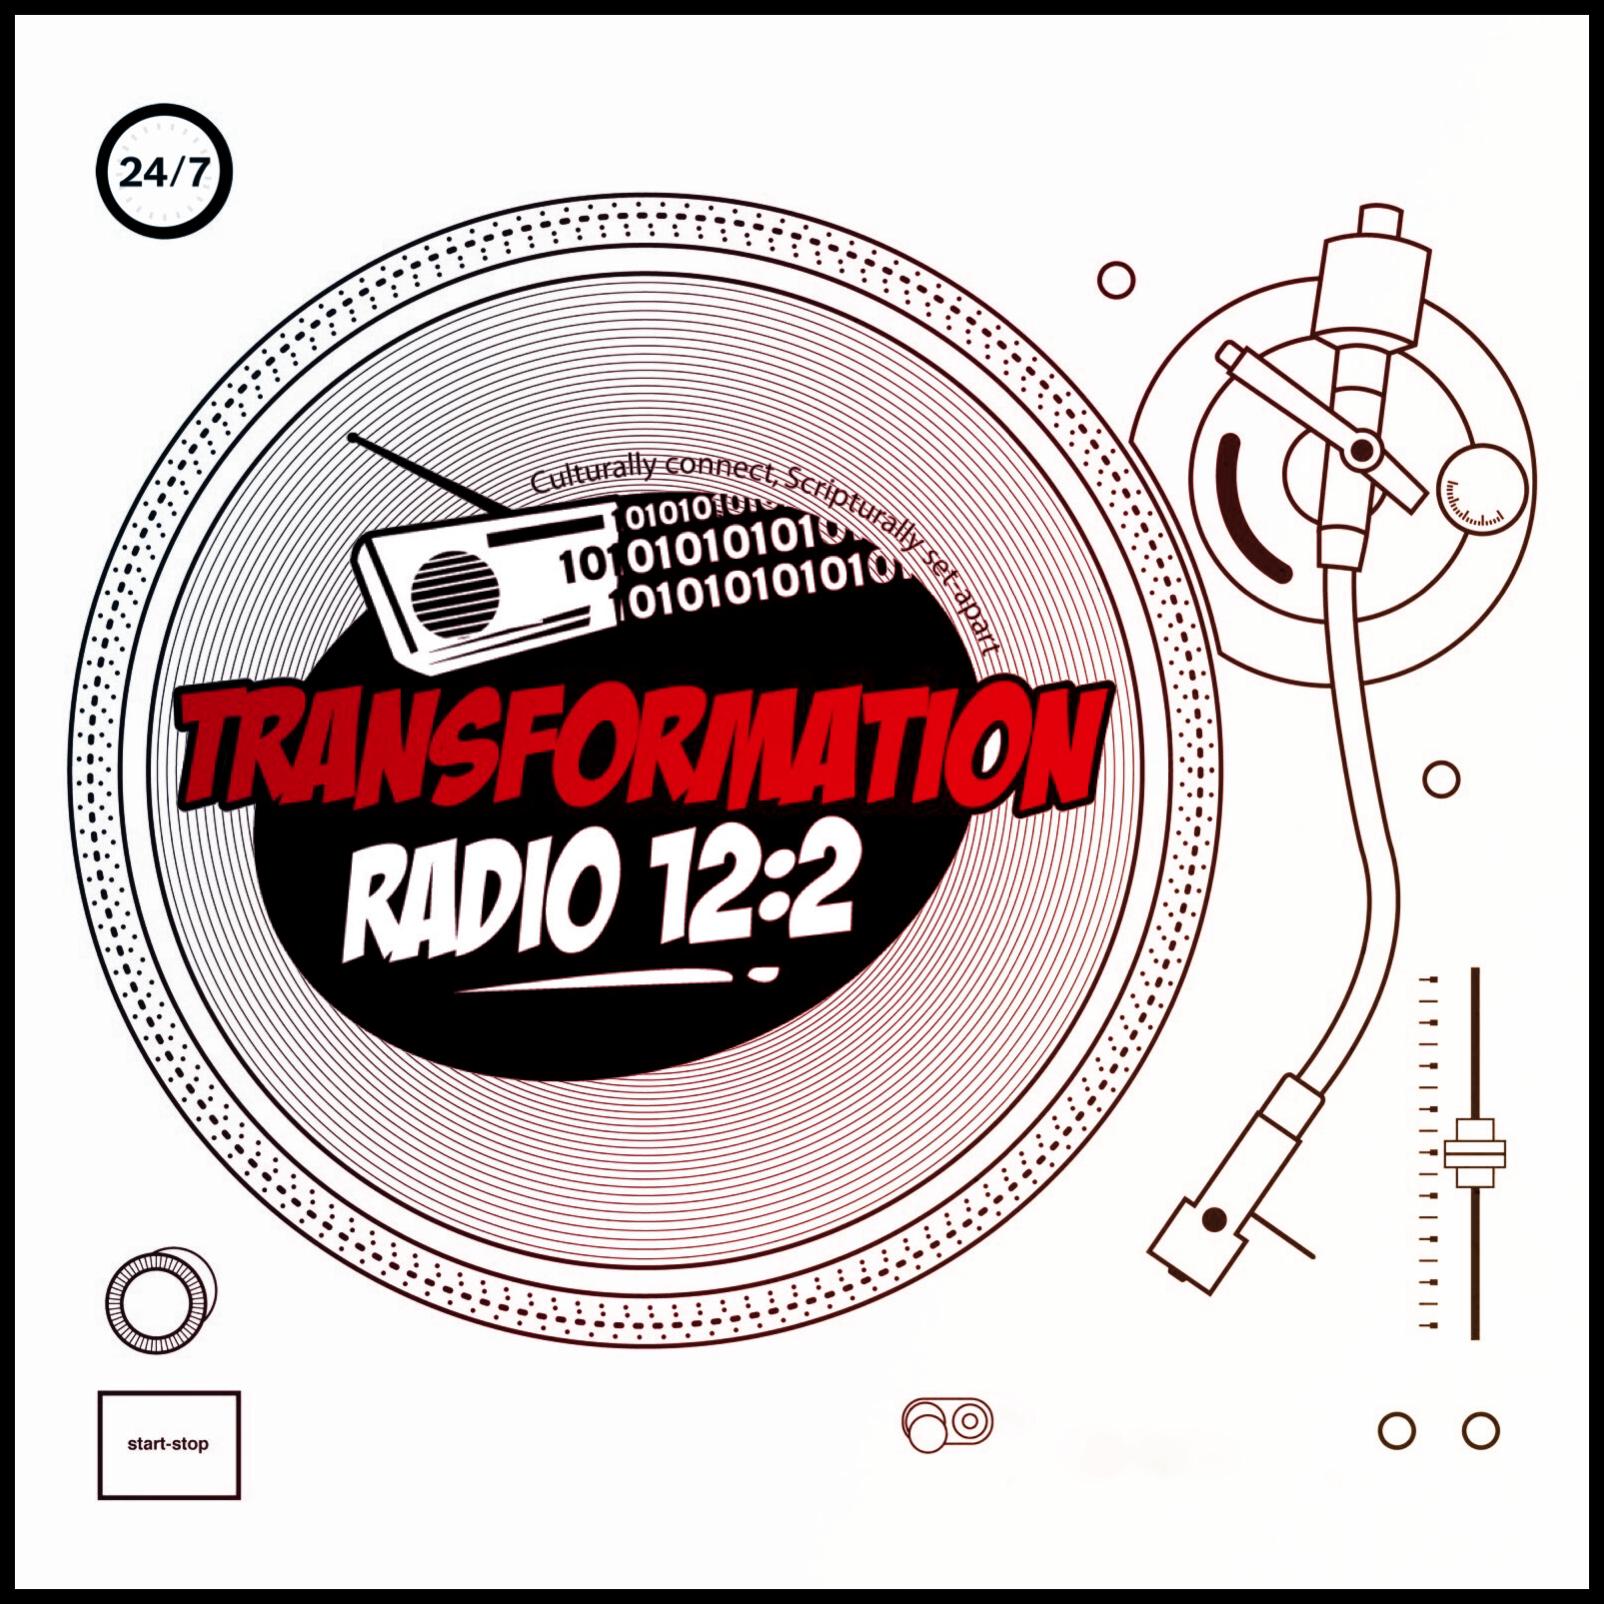 Art for Bangin that Jesus Muzik ALL DAY on Transformation Radio 12 2 by Transformation Radio 12:2